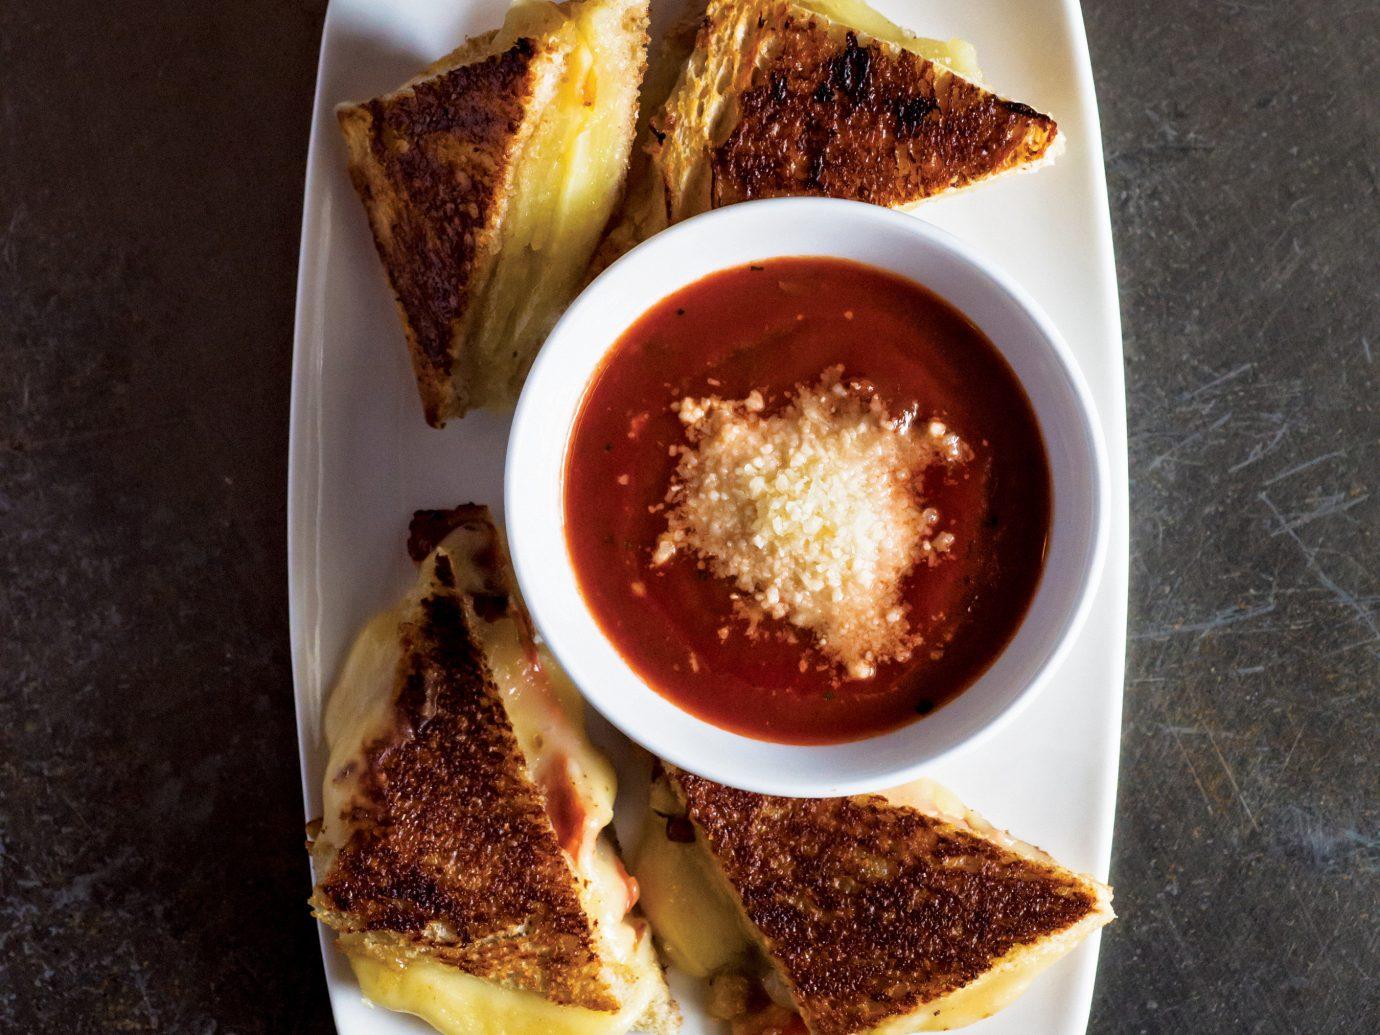 Food + Drink food dish plate meal breakfast dessert produce cuisine sliced